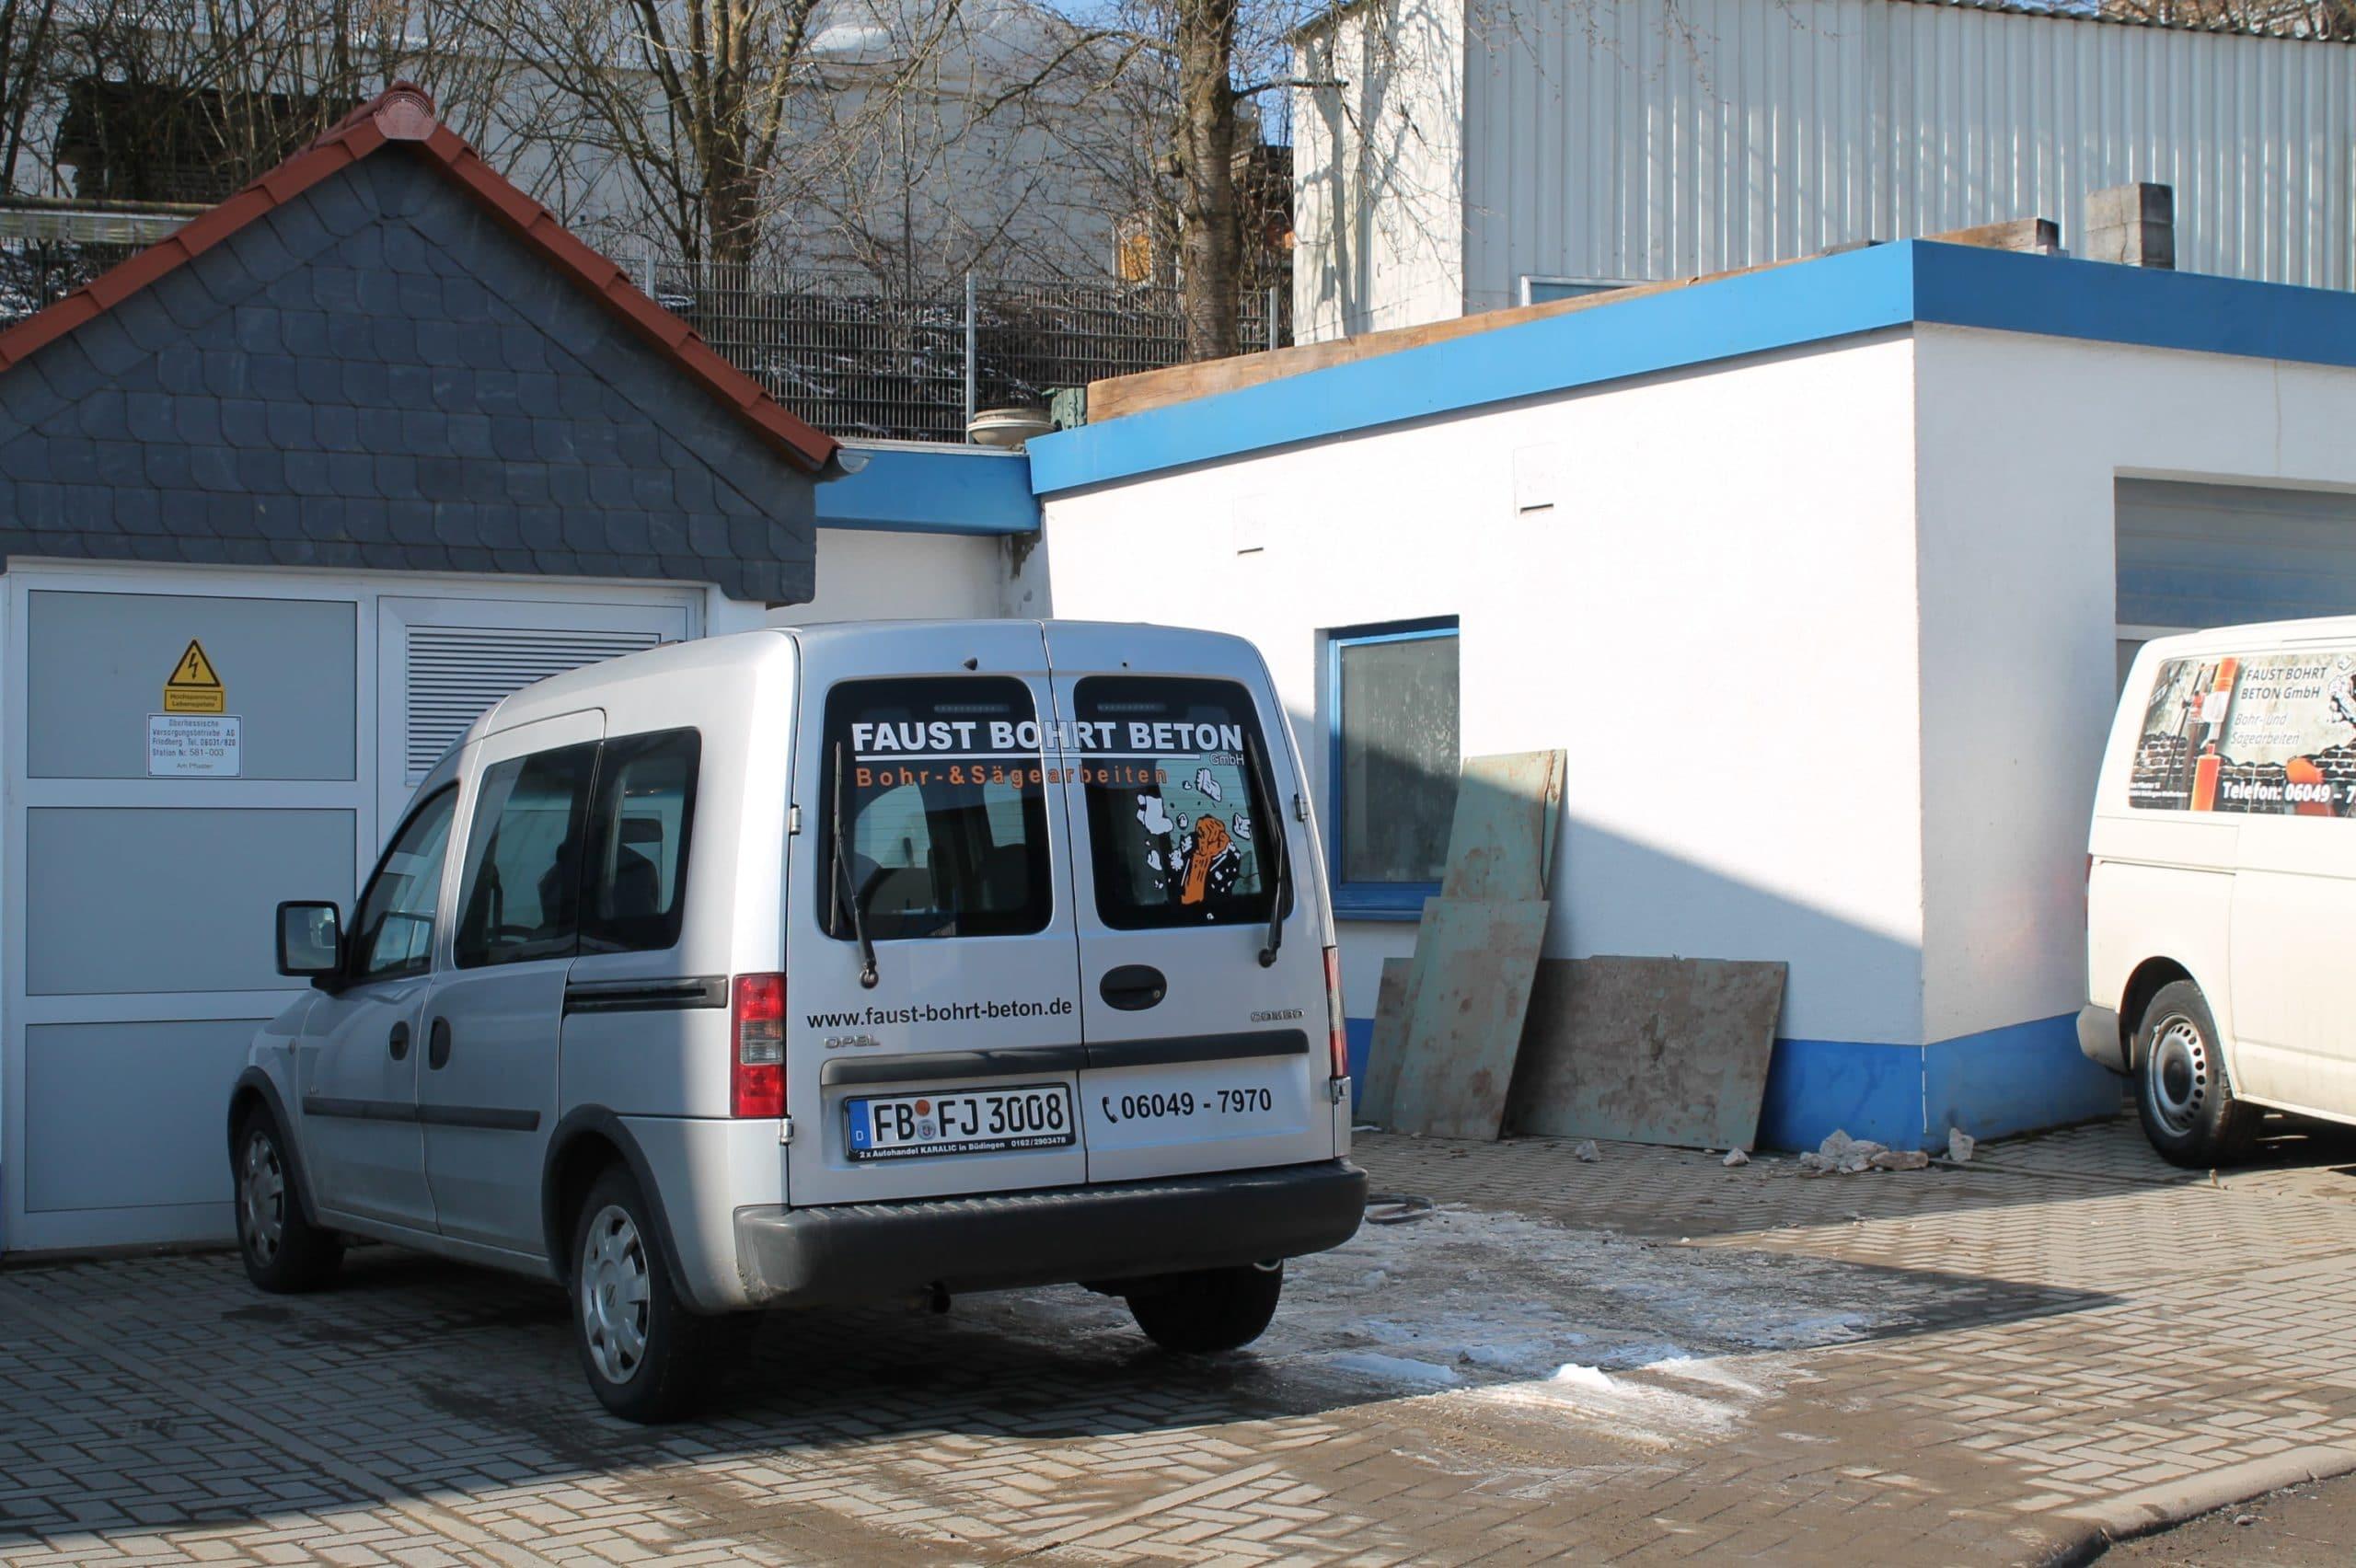 Faust bohrt Beton Fuhrpark 3